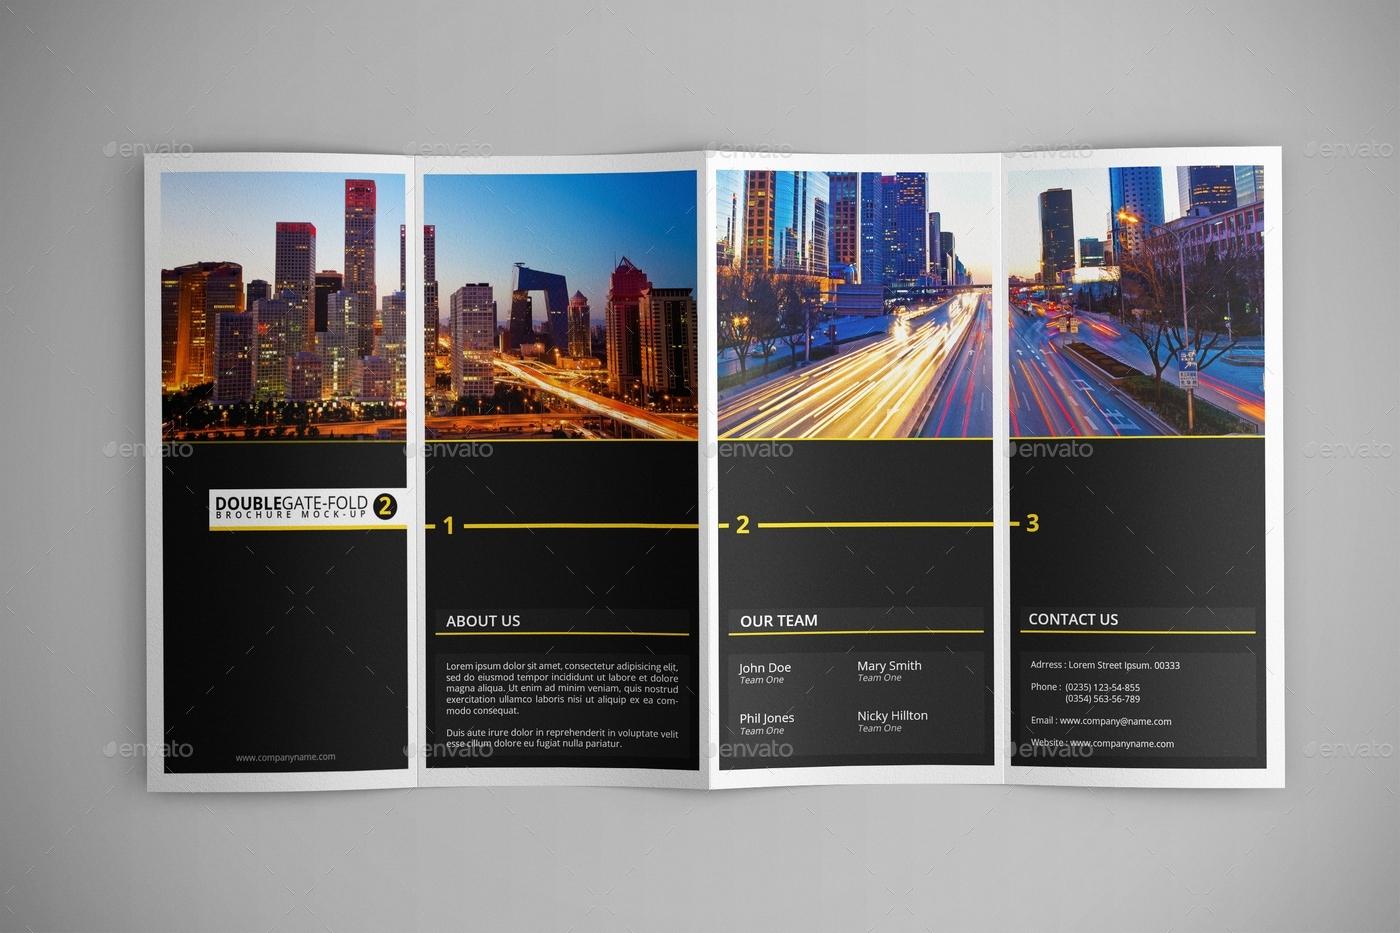 Download Double Gatefold Brochure MockUp 2 Free – Gate Fold Brochure Mockup